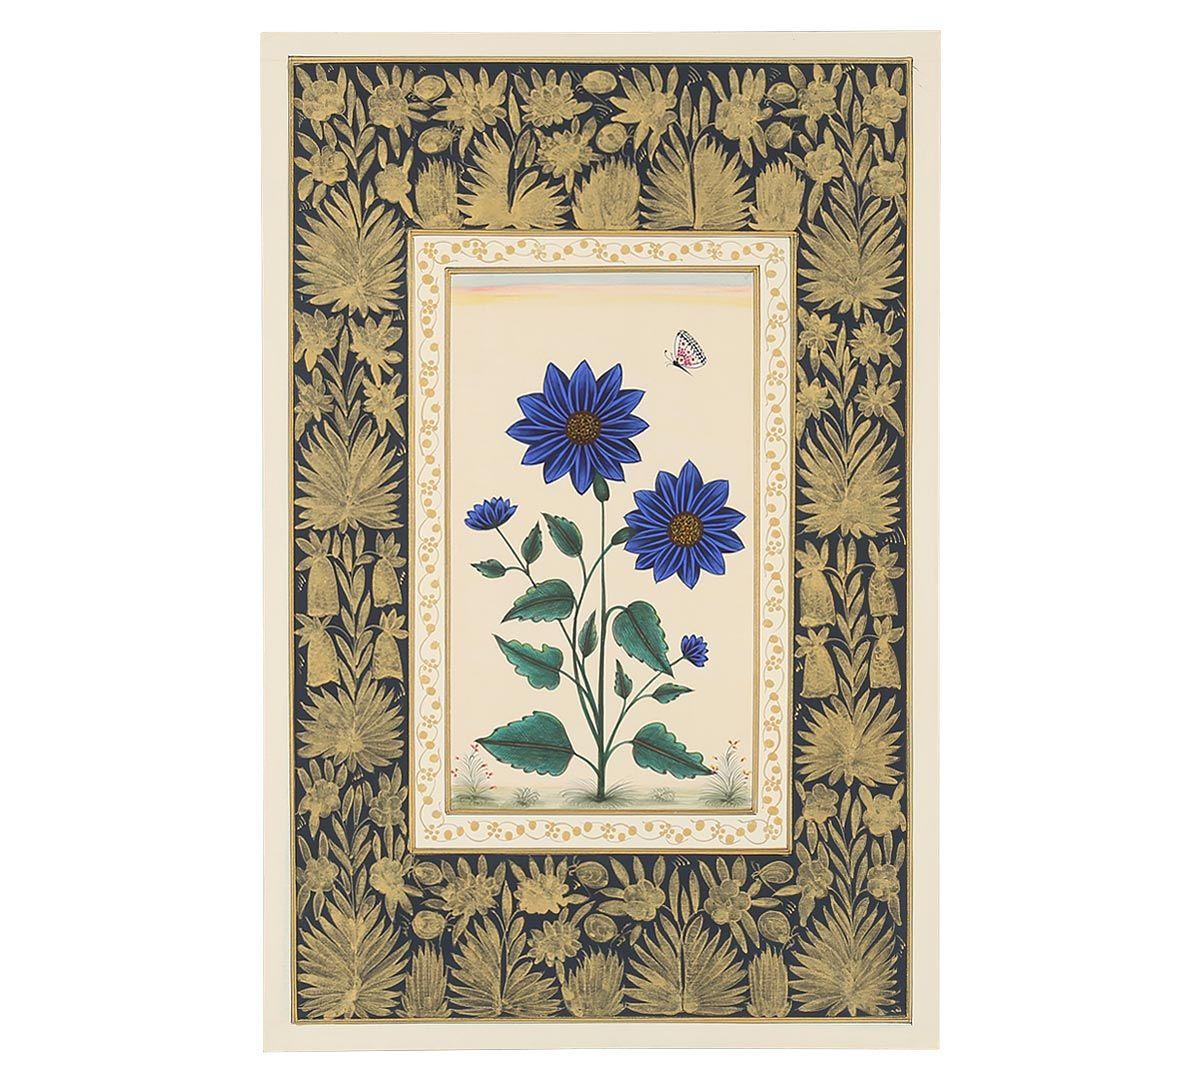 India Circus Blue Sunflower Handmade Poster